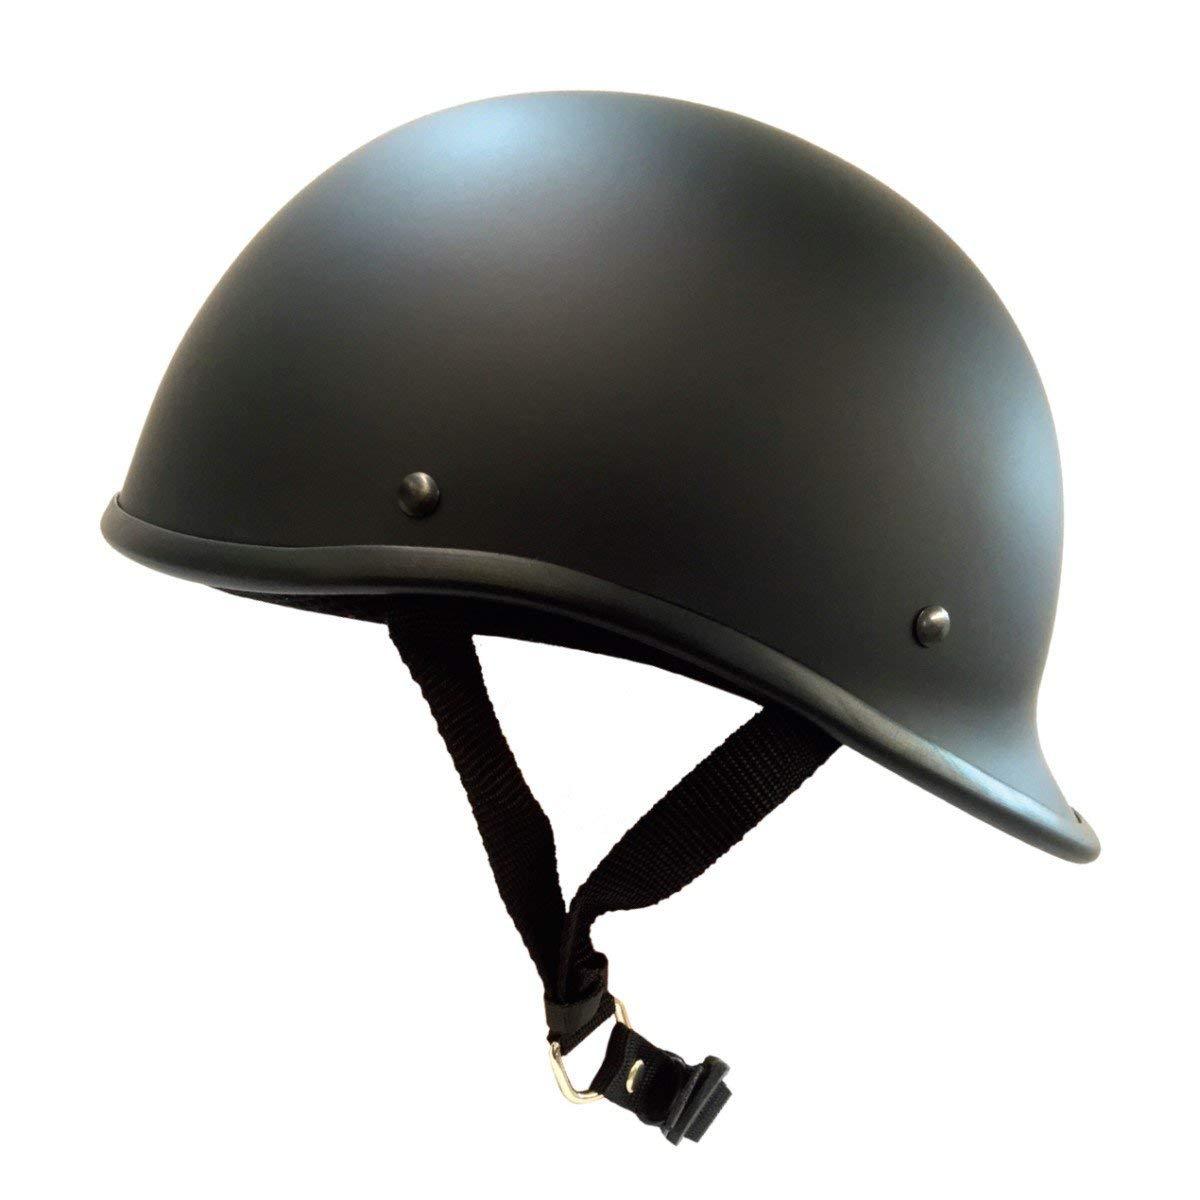 MicroDOT Helmet